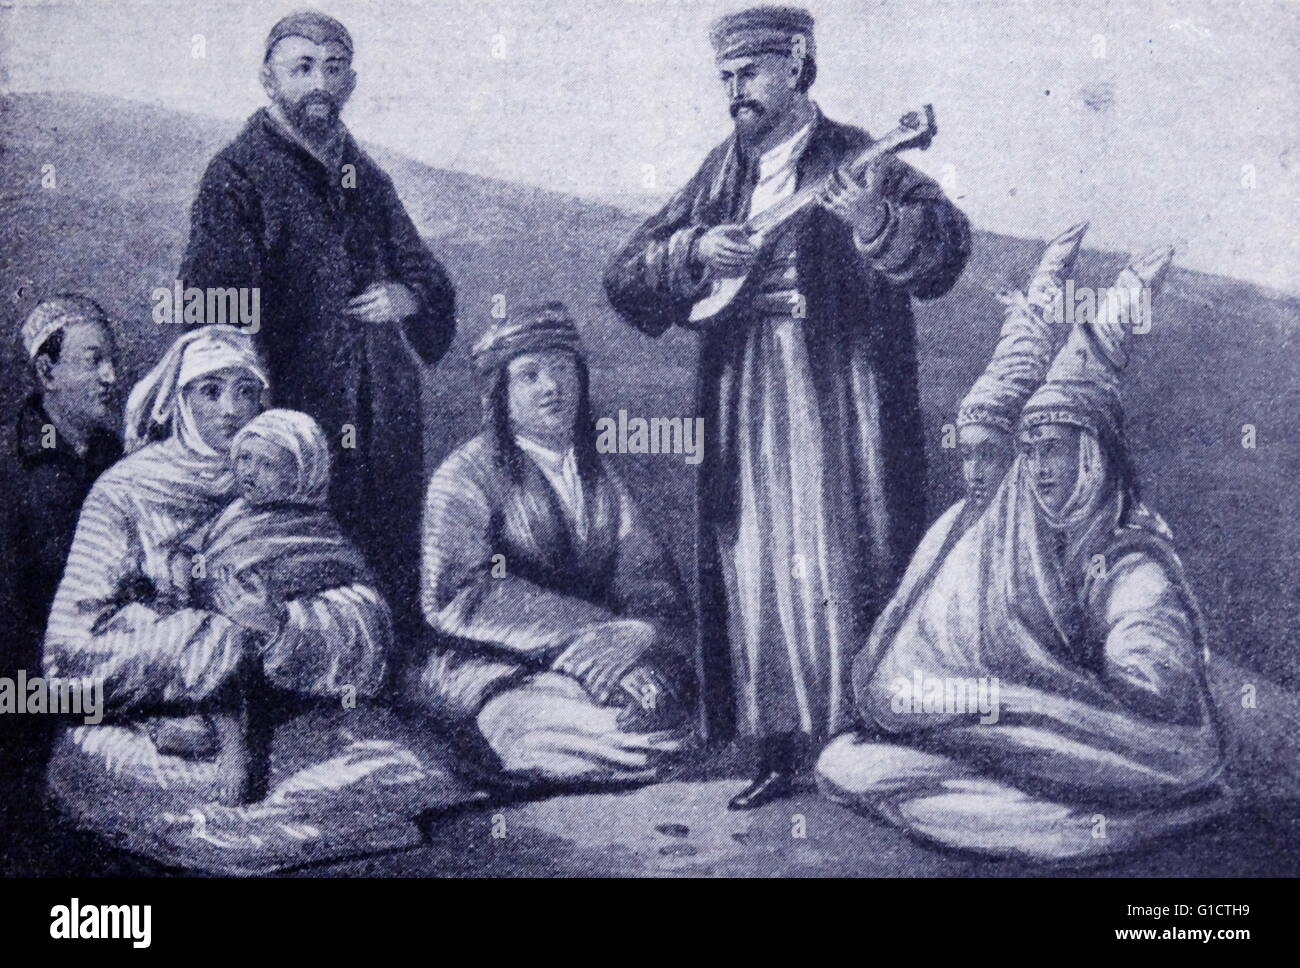 The Kyrgyz people; Kyrgyzstan; Russian Empire 1860 - Stock Image